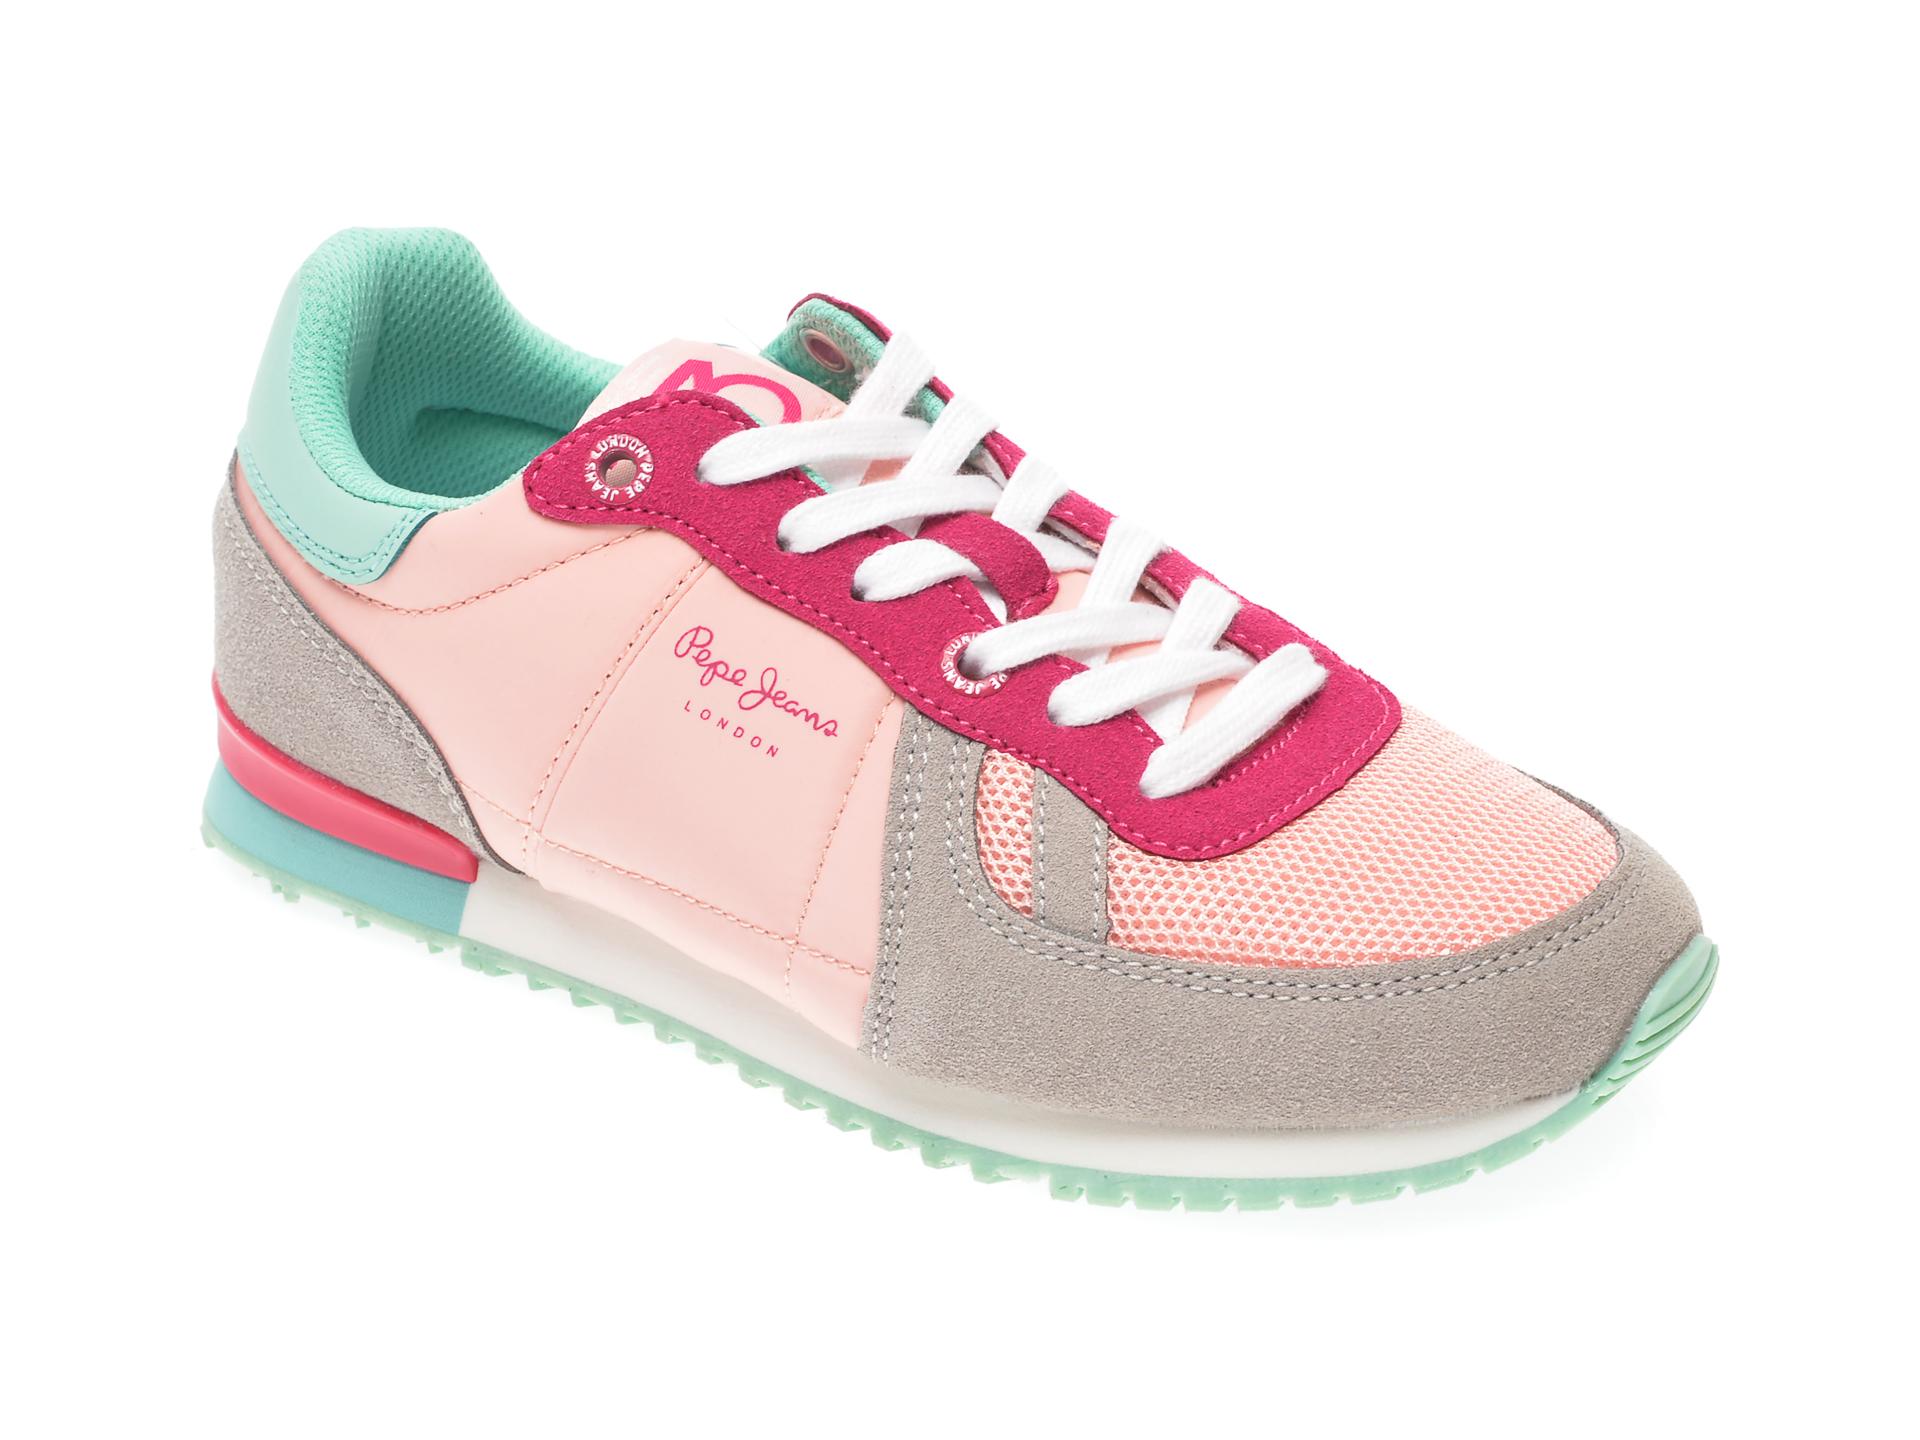 Pantofi sport PEPE JEANS multicolor, GS30432, din material textil si piele ecologica New